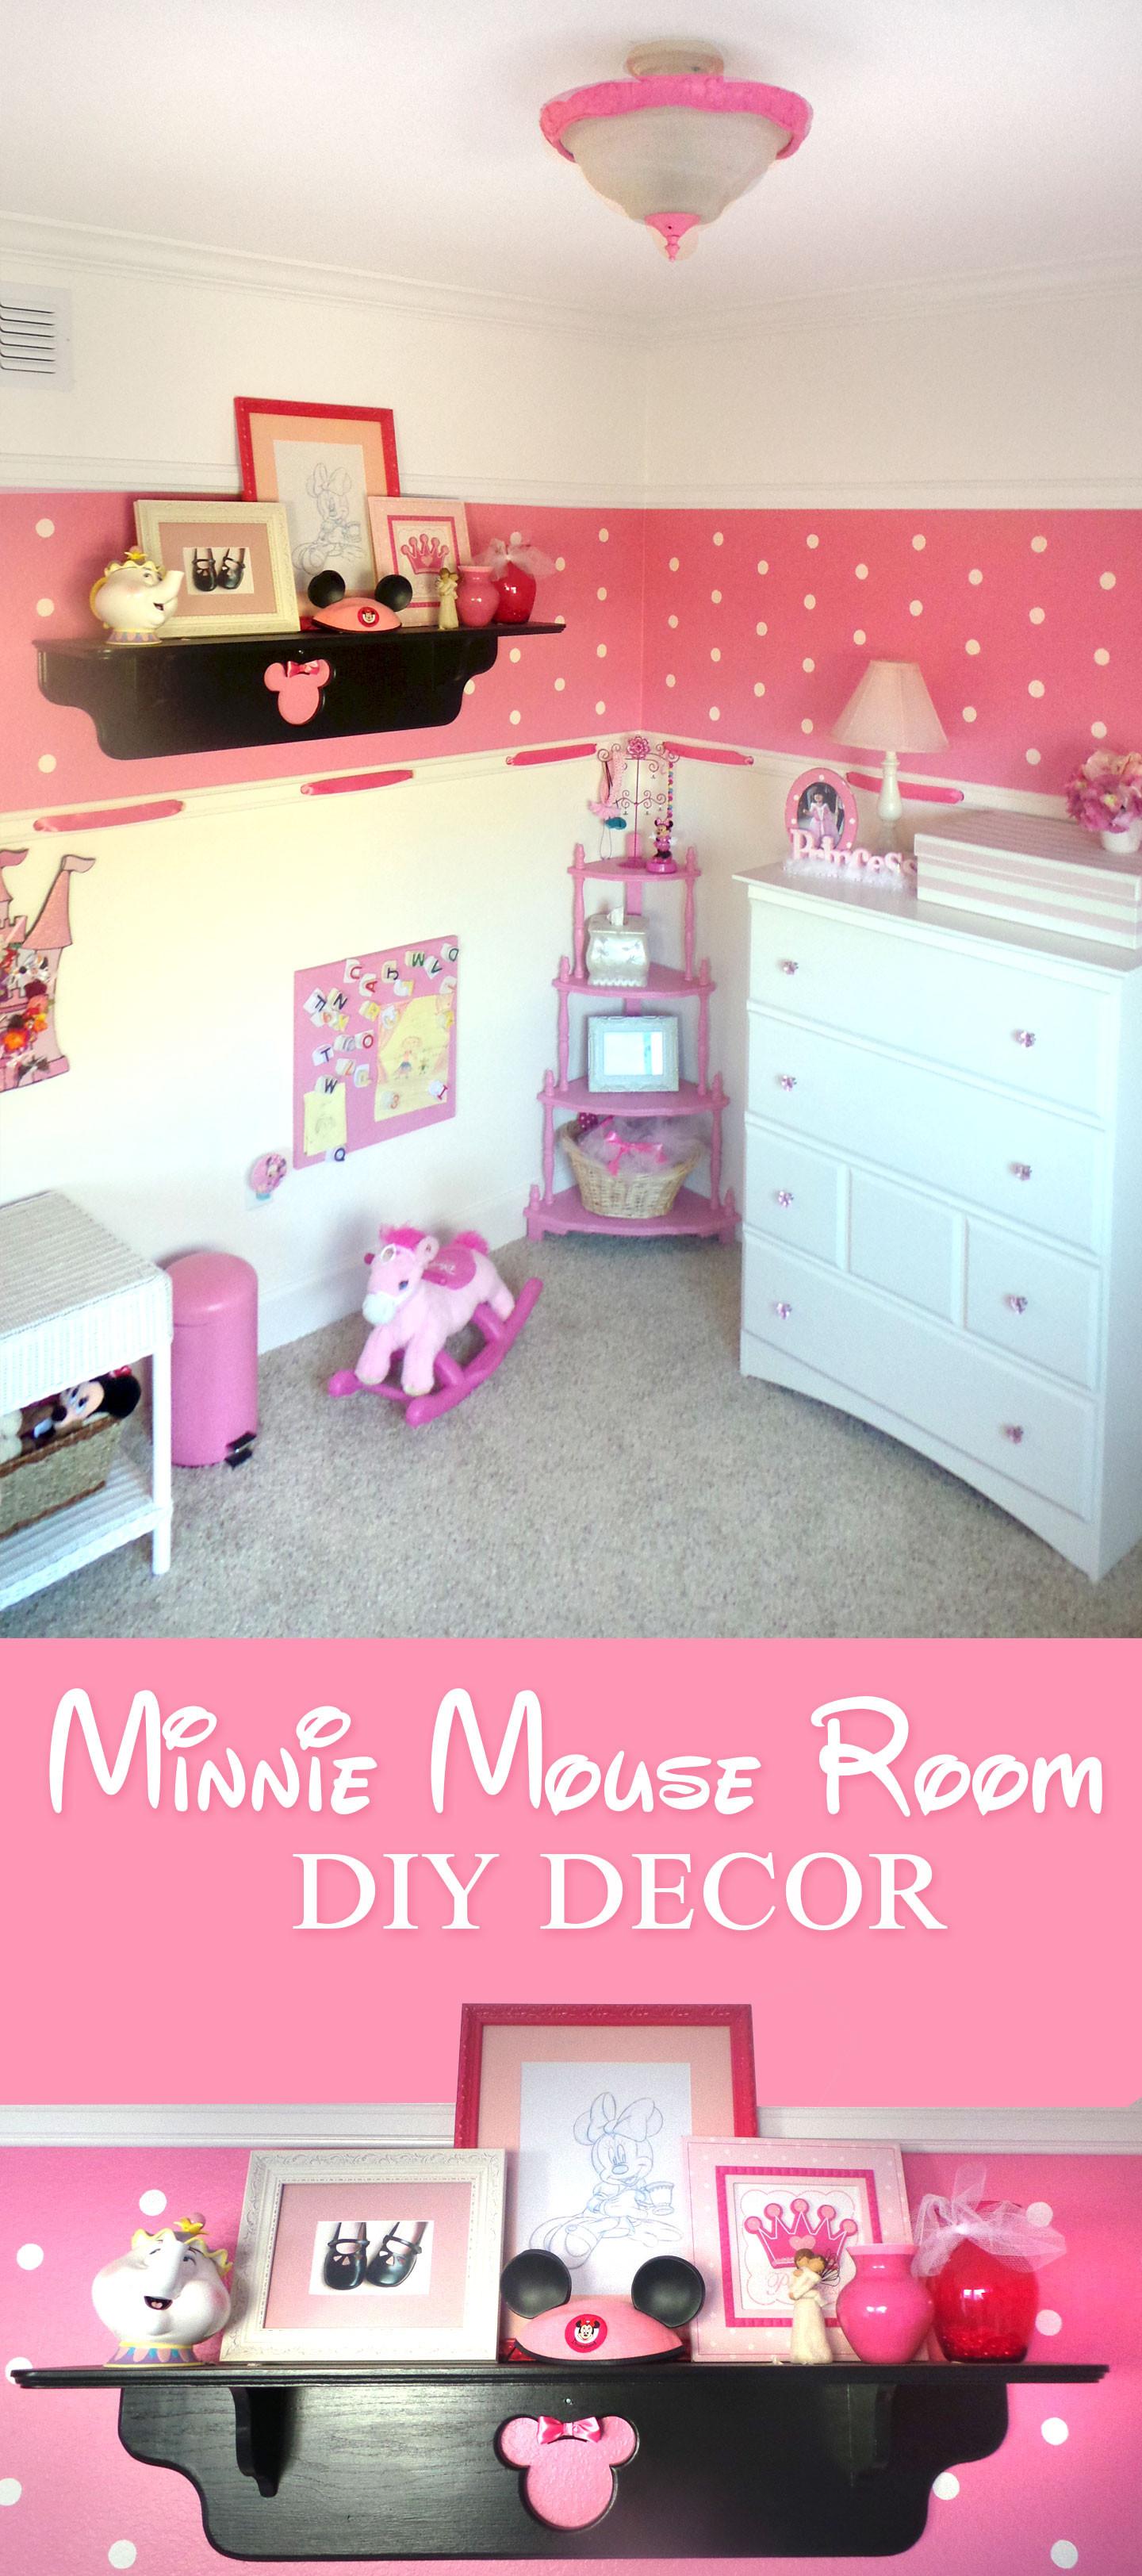 Room Diy  Minnie Mouse Room DIY Decor Highlights Along the Way